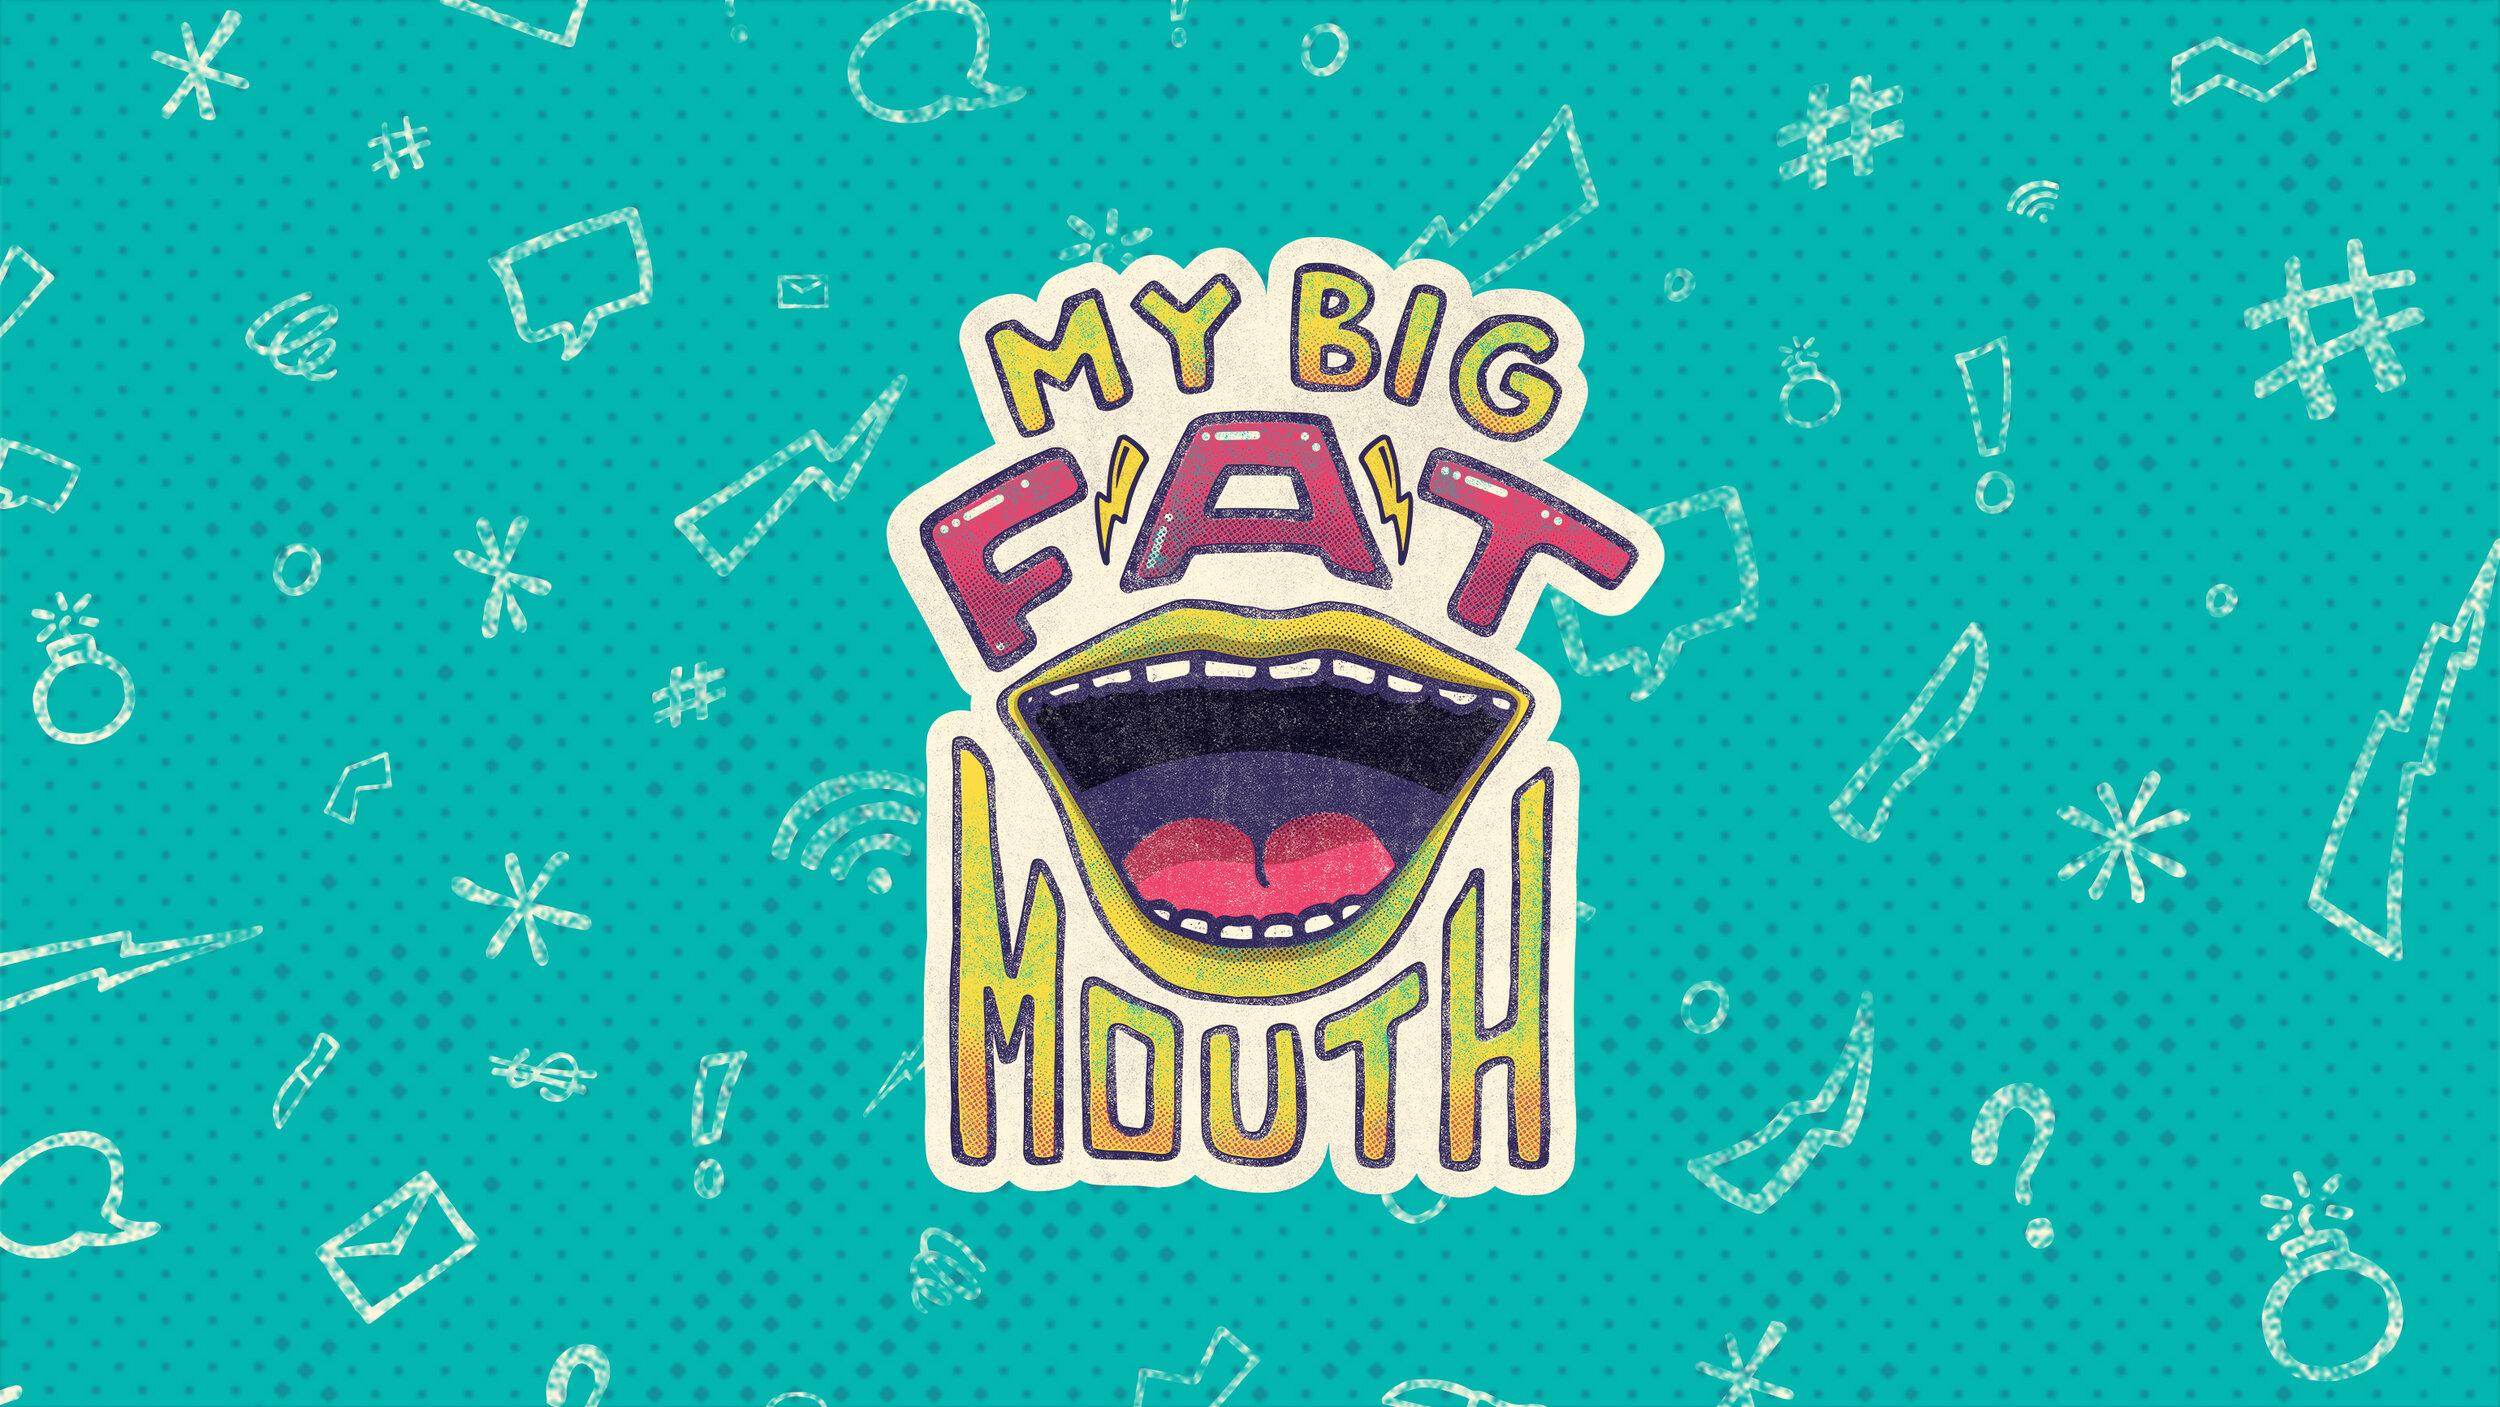 Big Fat Mouth Main.jpg